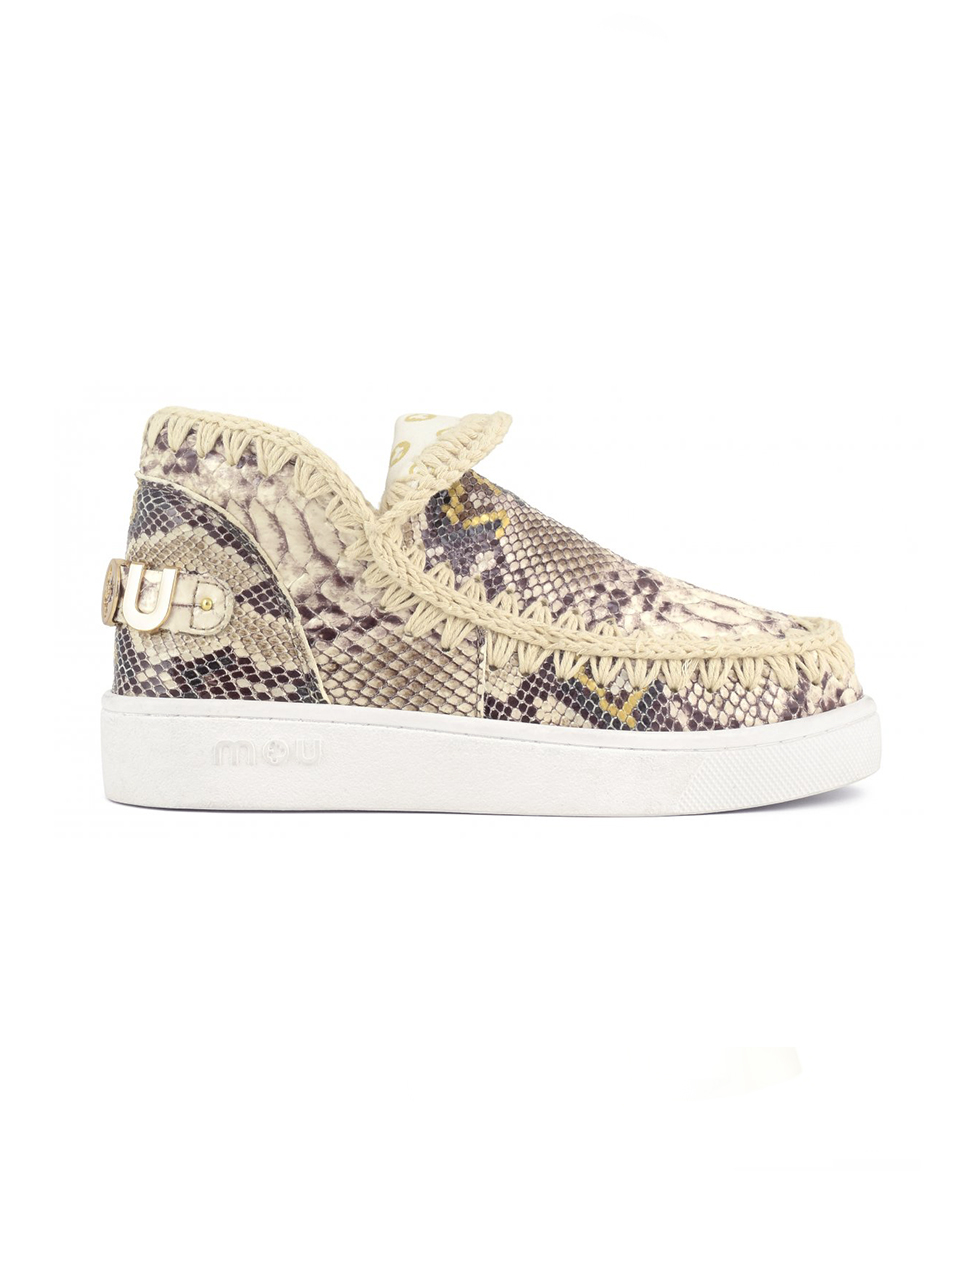 MOU Summer Eskimo Sneakers in Rock Snake Alternate Angle